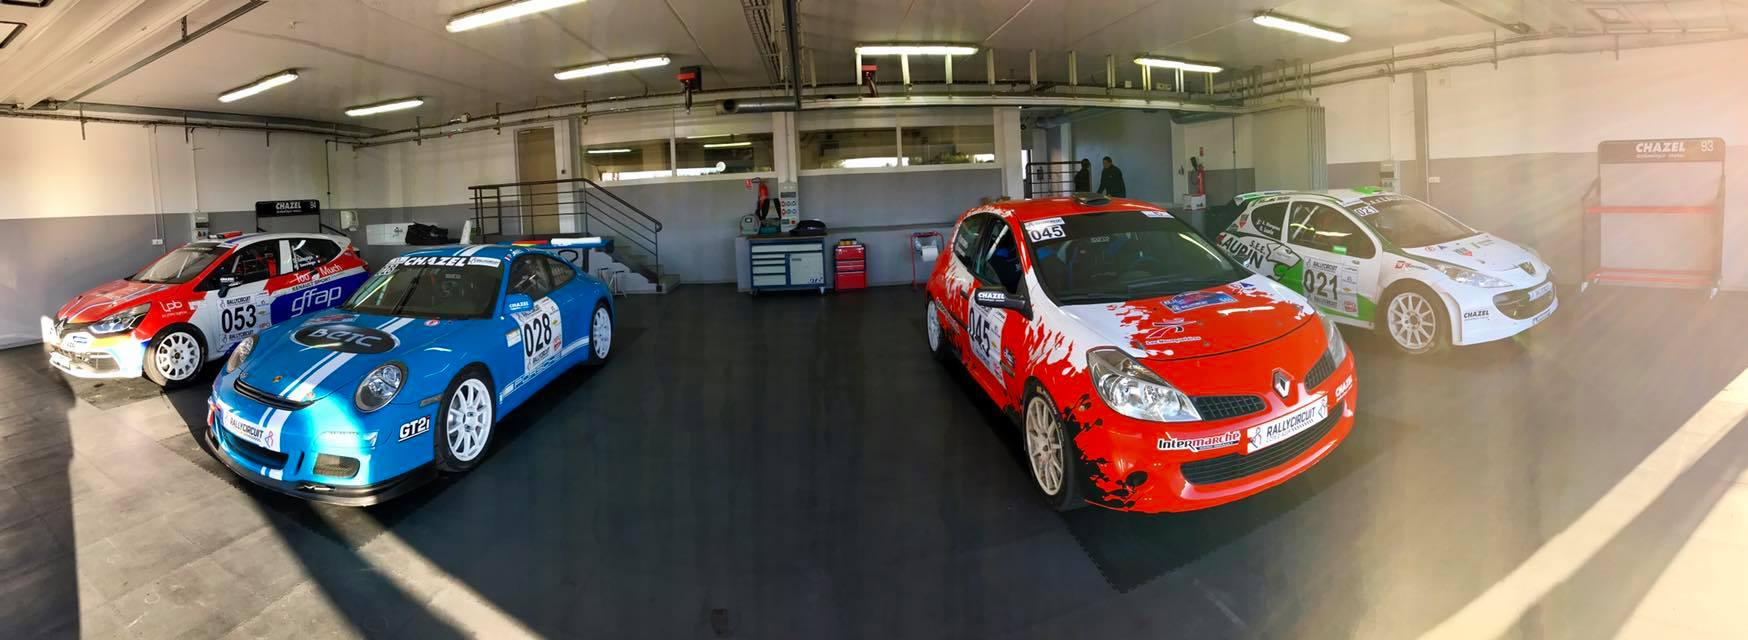 chazel-rally-circuit-2016